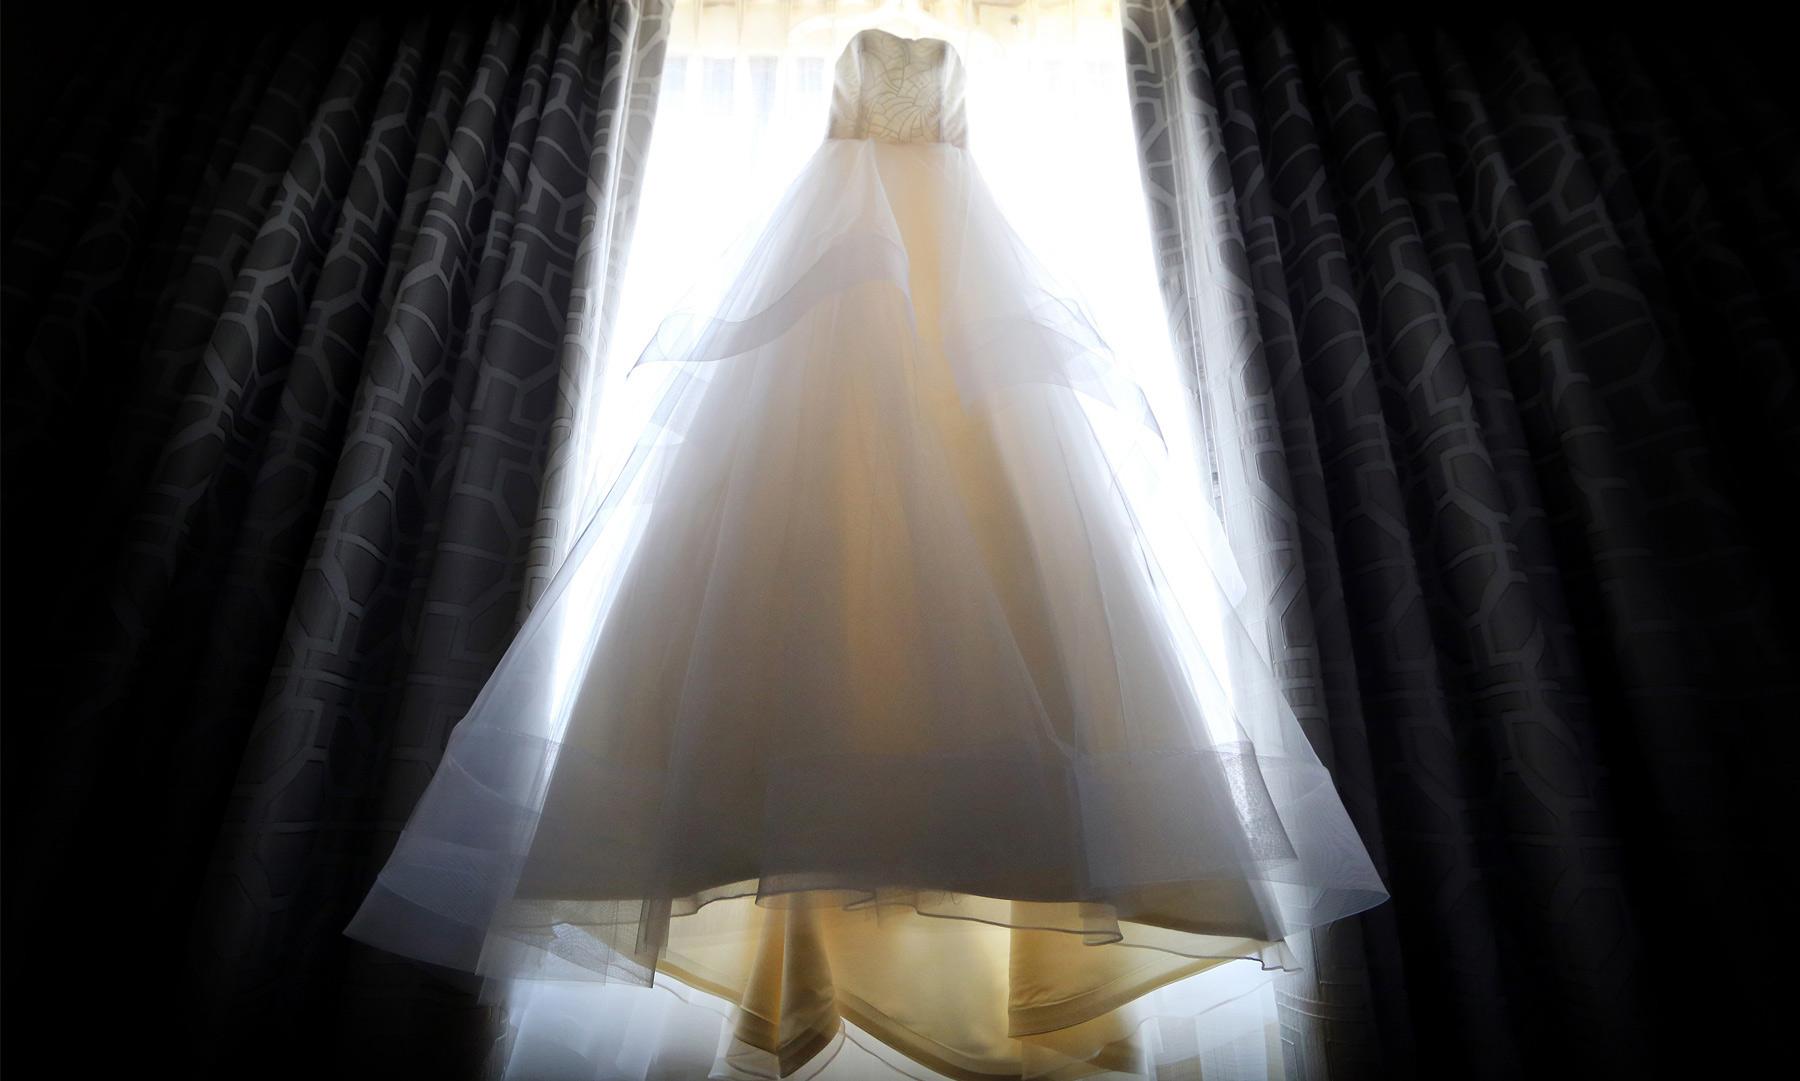 01-Minneapolis-Minnesota-Wedding-Photography-by-Vick-Photography-Hilton-Downtown-Dress-Lisa-and-Jared.jpg